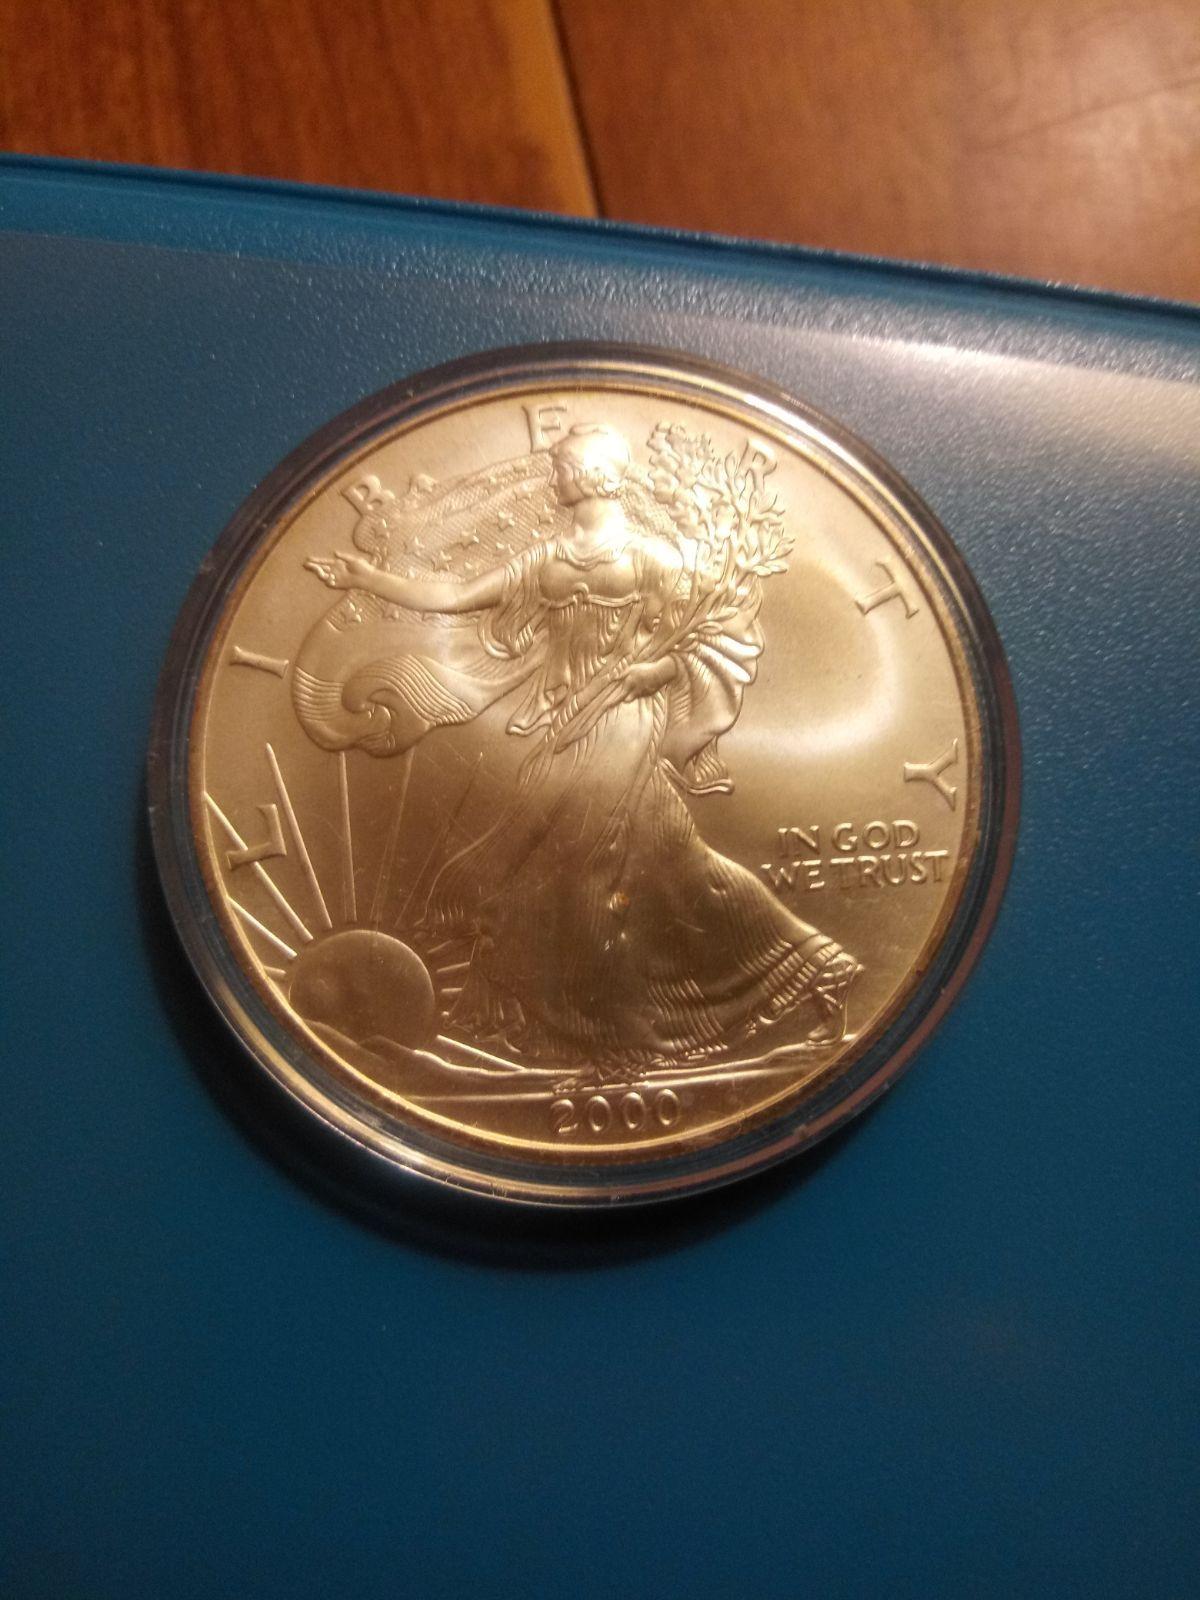 2000 Walking Liberty Uncirculated Silver Dollar No Mint Mark Amazing Condition 2005 Indian Head Buffalo Nickle Copy Silver Silver Coins Silver Silver Dollar